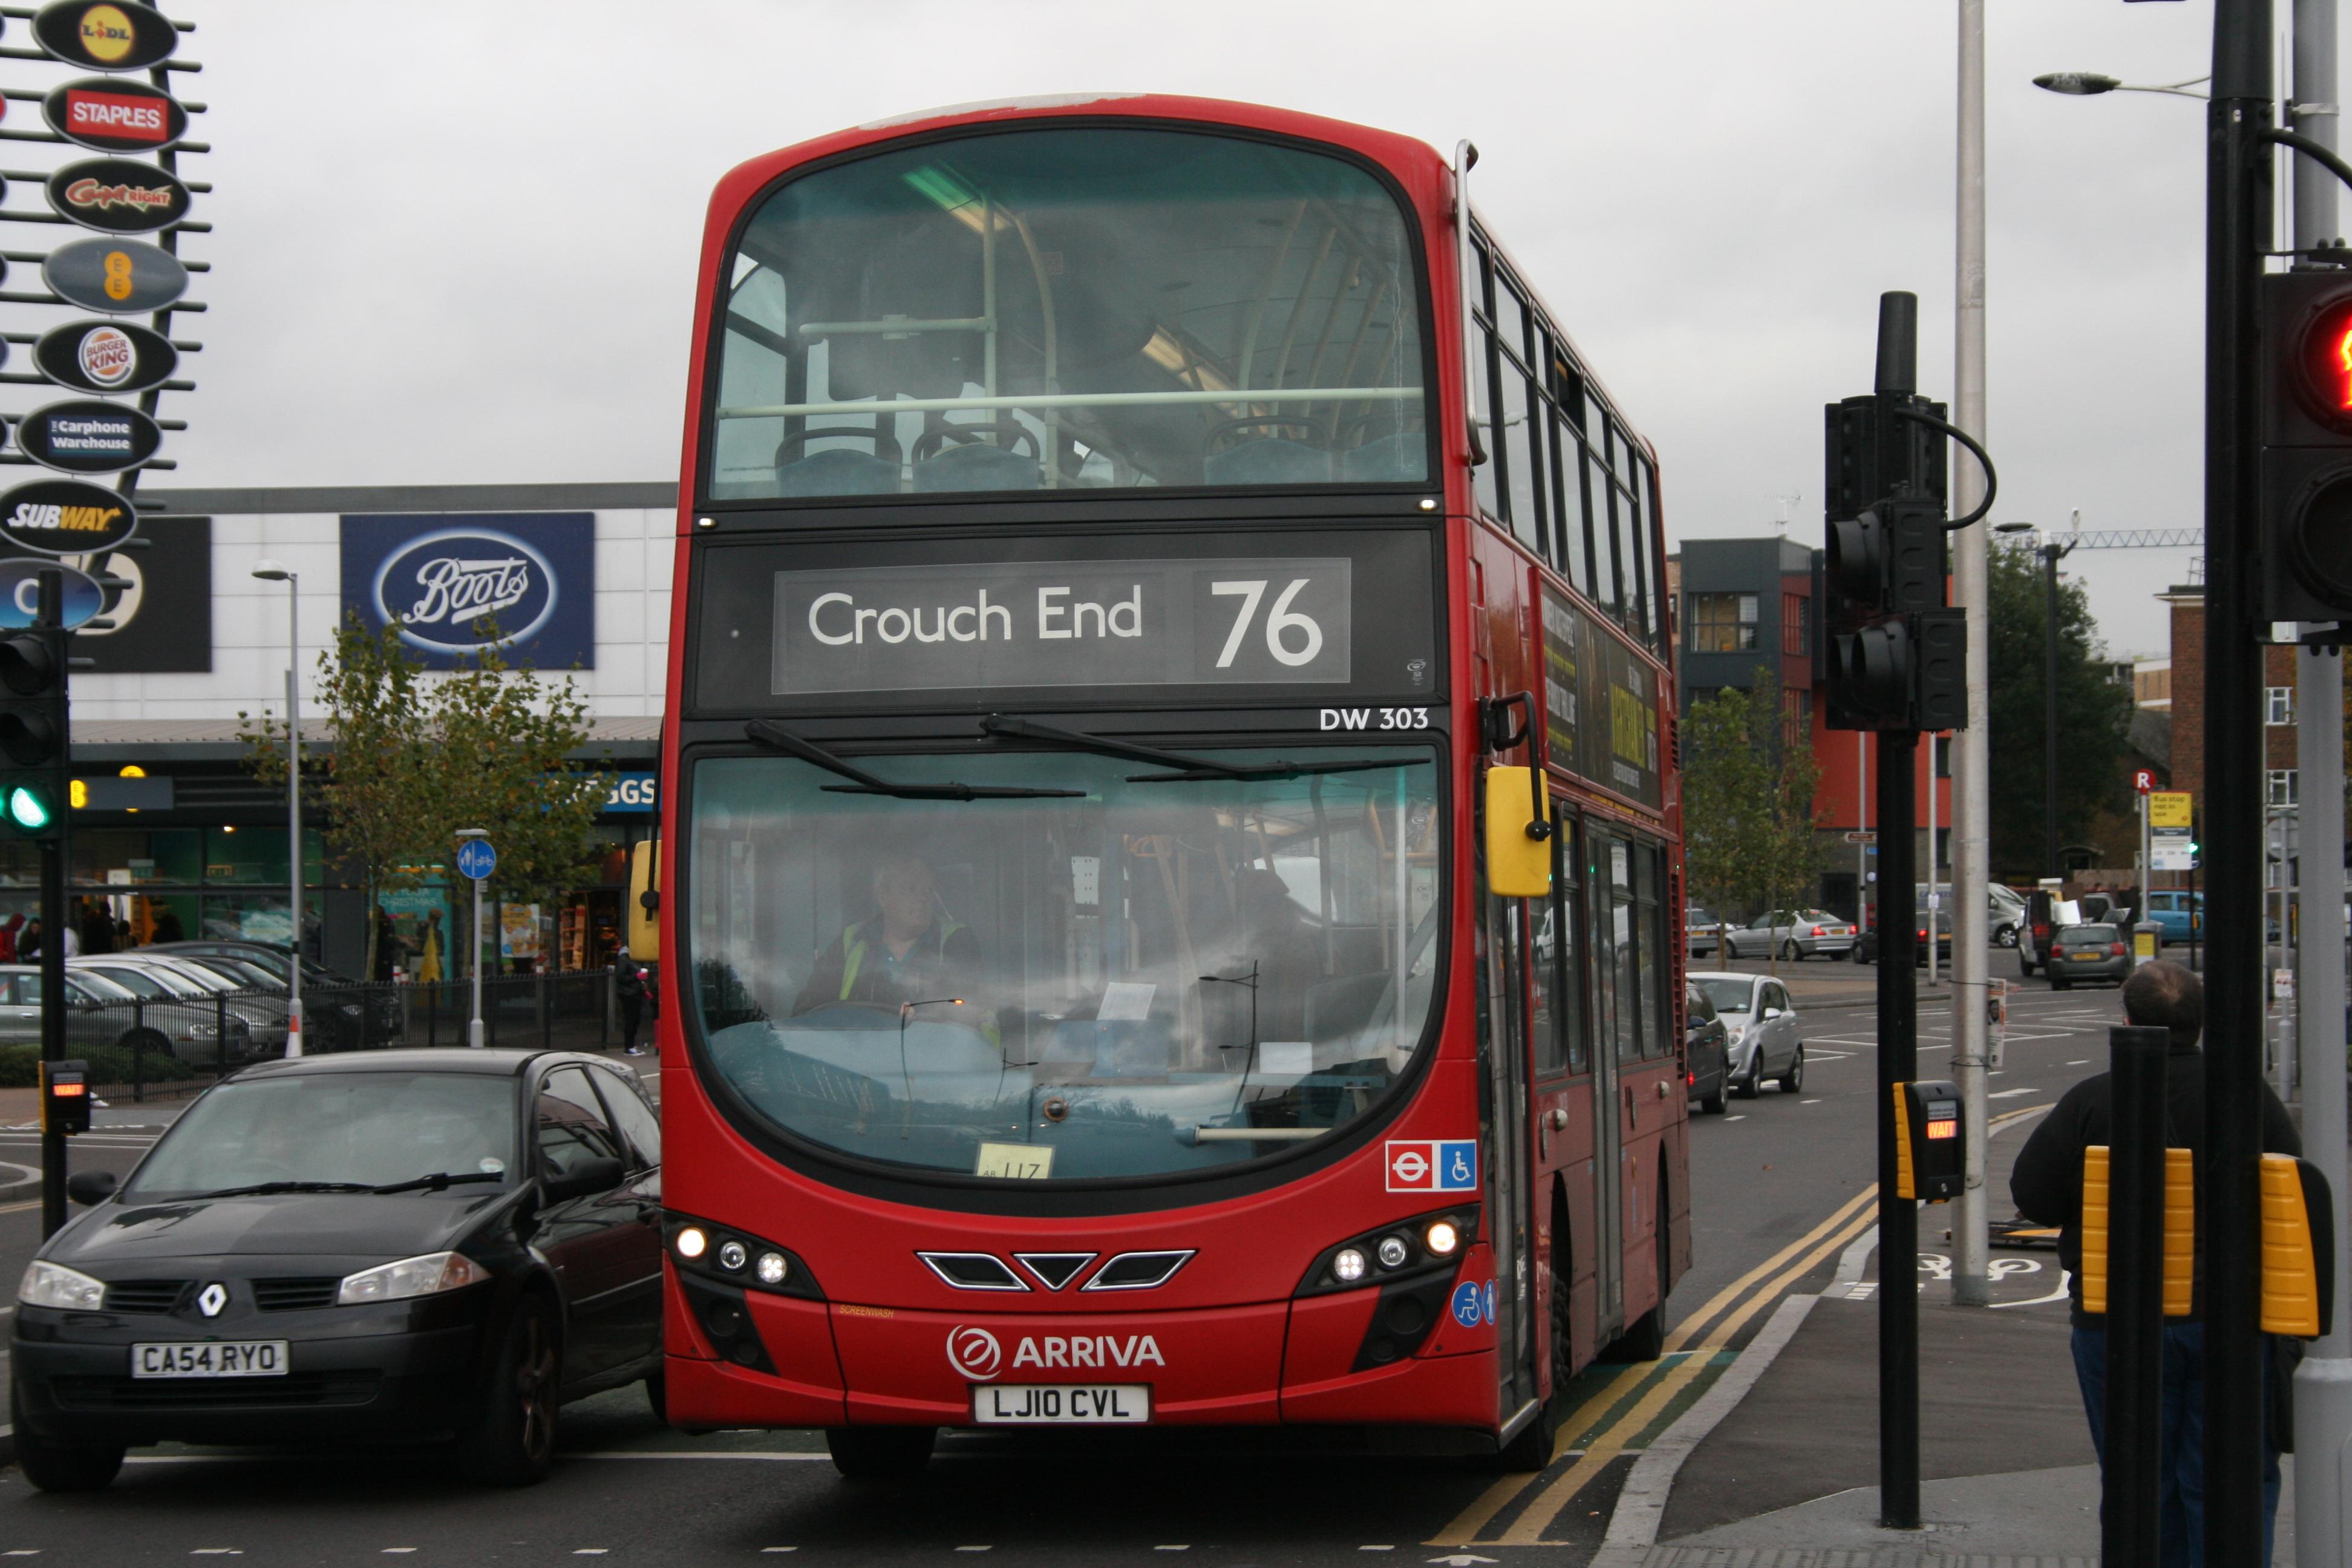 File Arriva London Dw303 On Route 76 Tottenham Hale